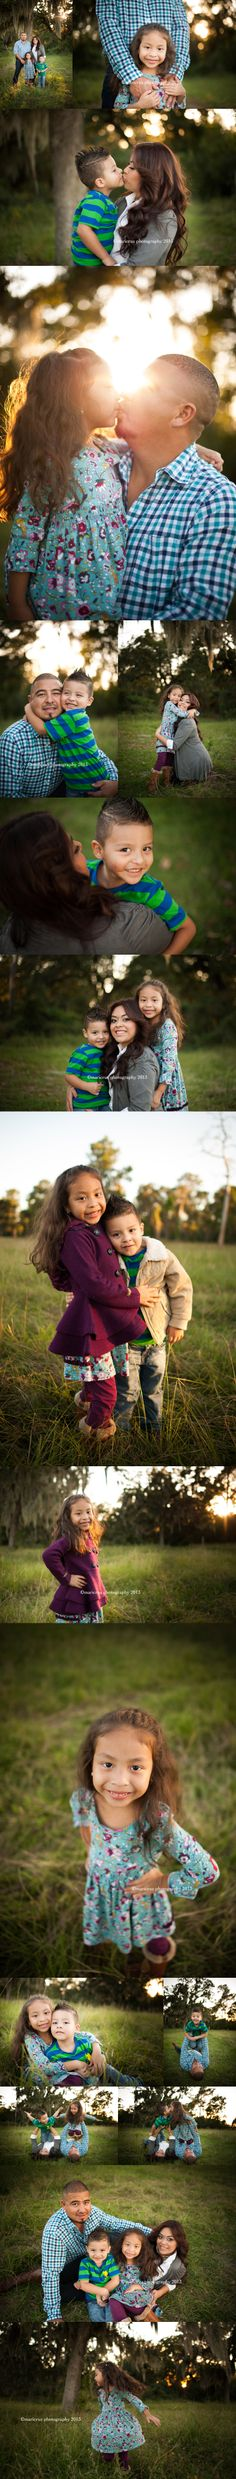 famili photographi, famili pose, tx famili, photographi famili